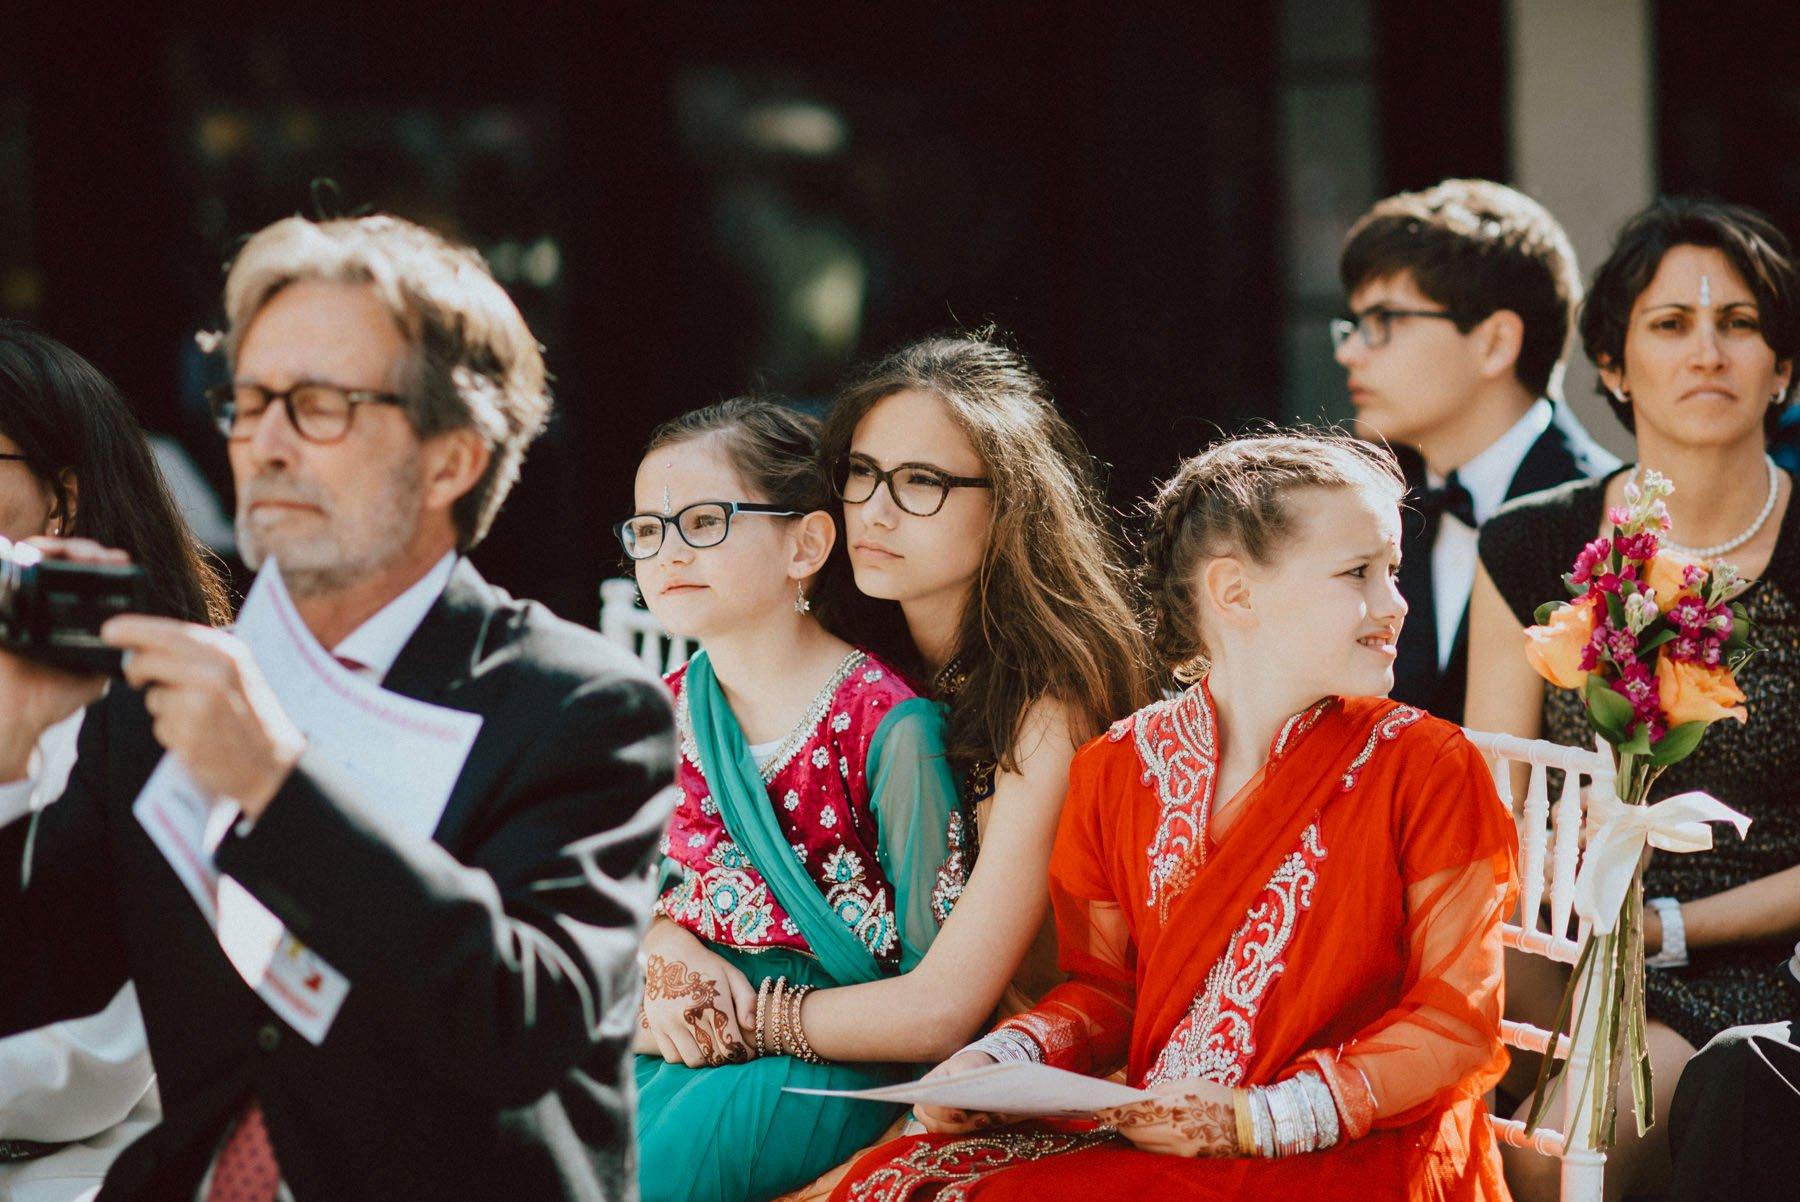 vie-philadelphia-indian-wedding-69.jpg